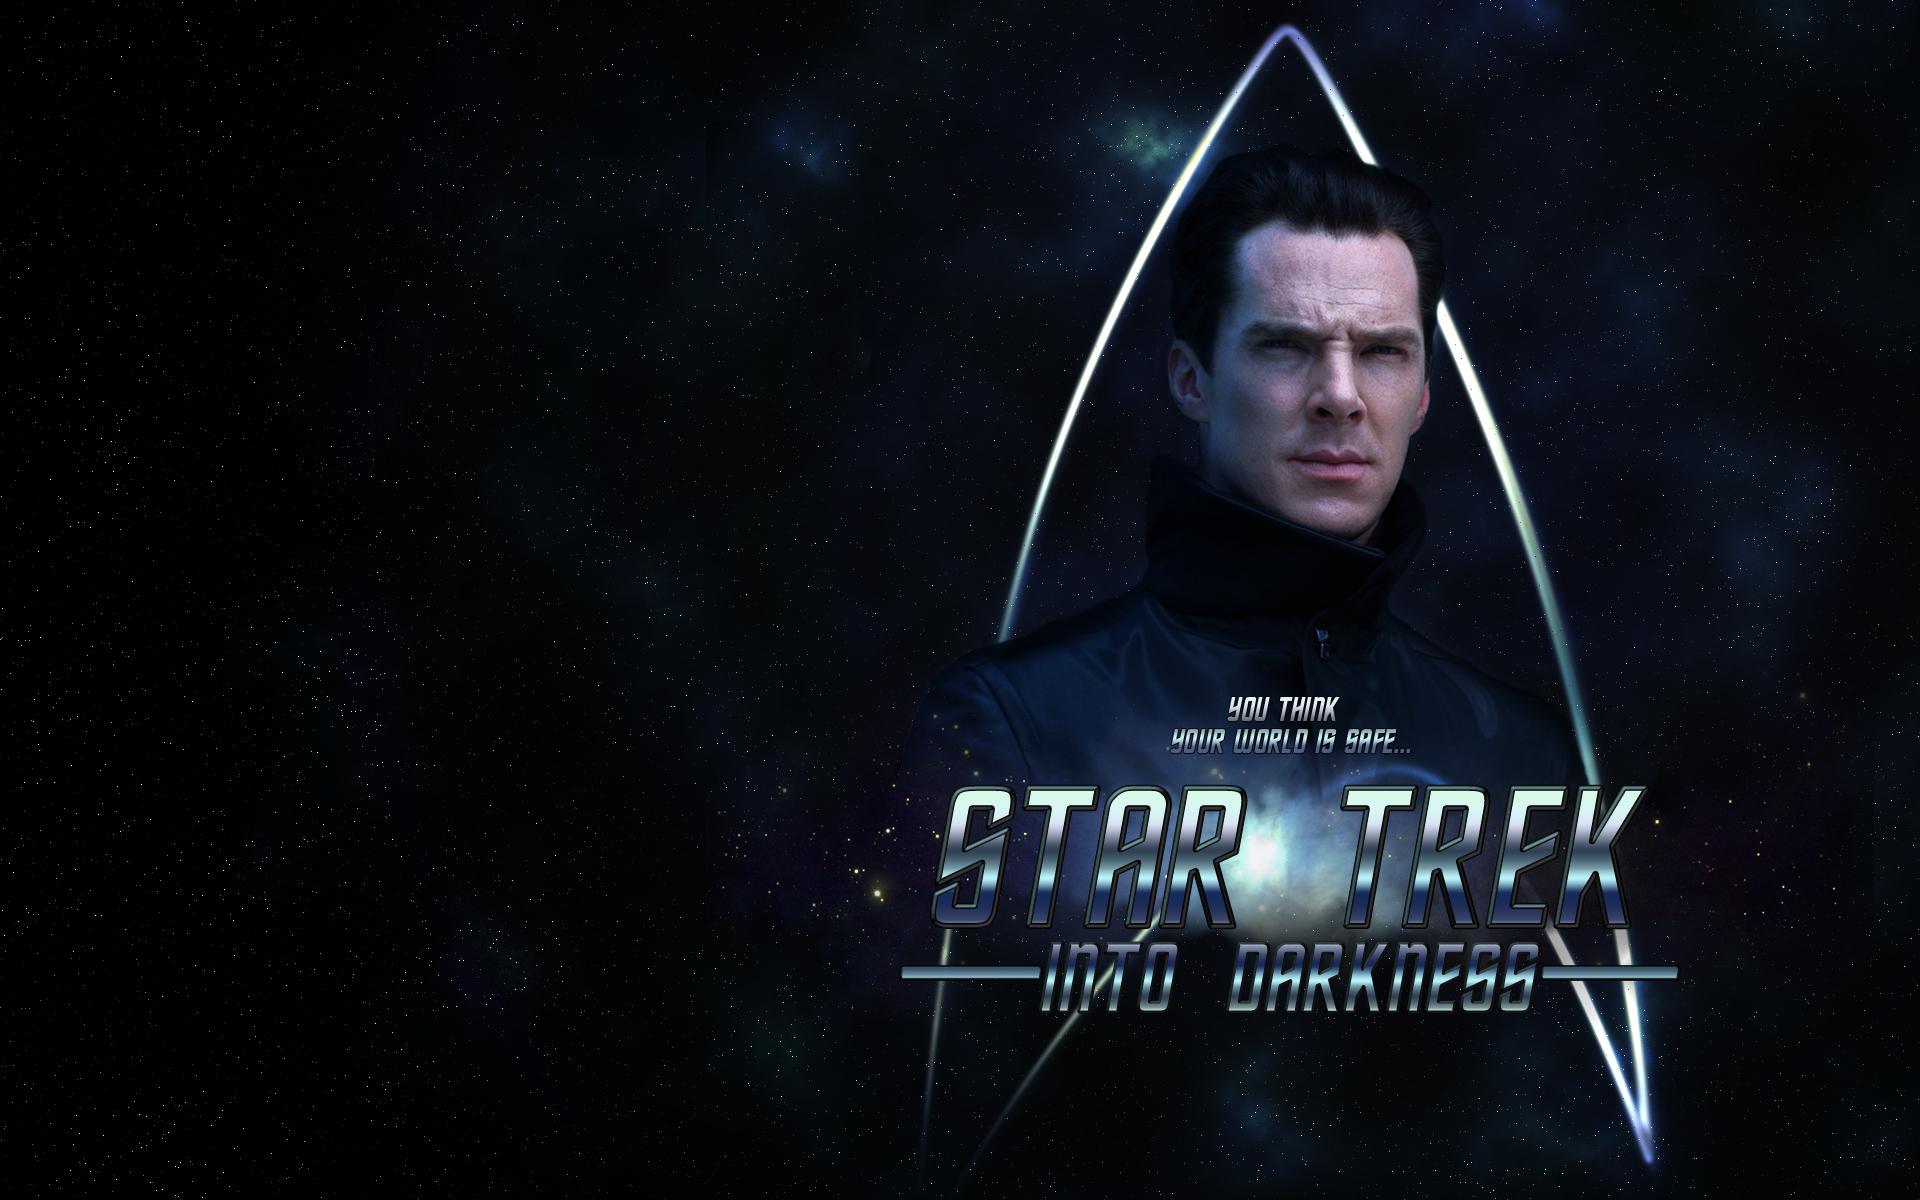 Star Trek Into Darkness Movie HD Wallpapers 2013 1920x1200